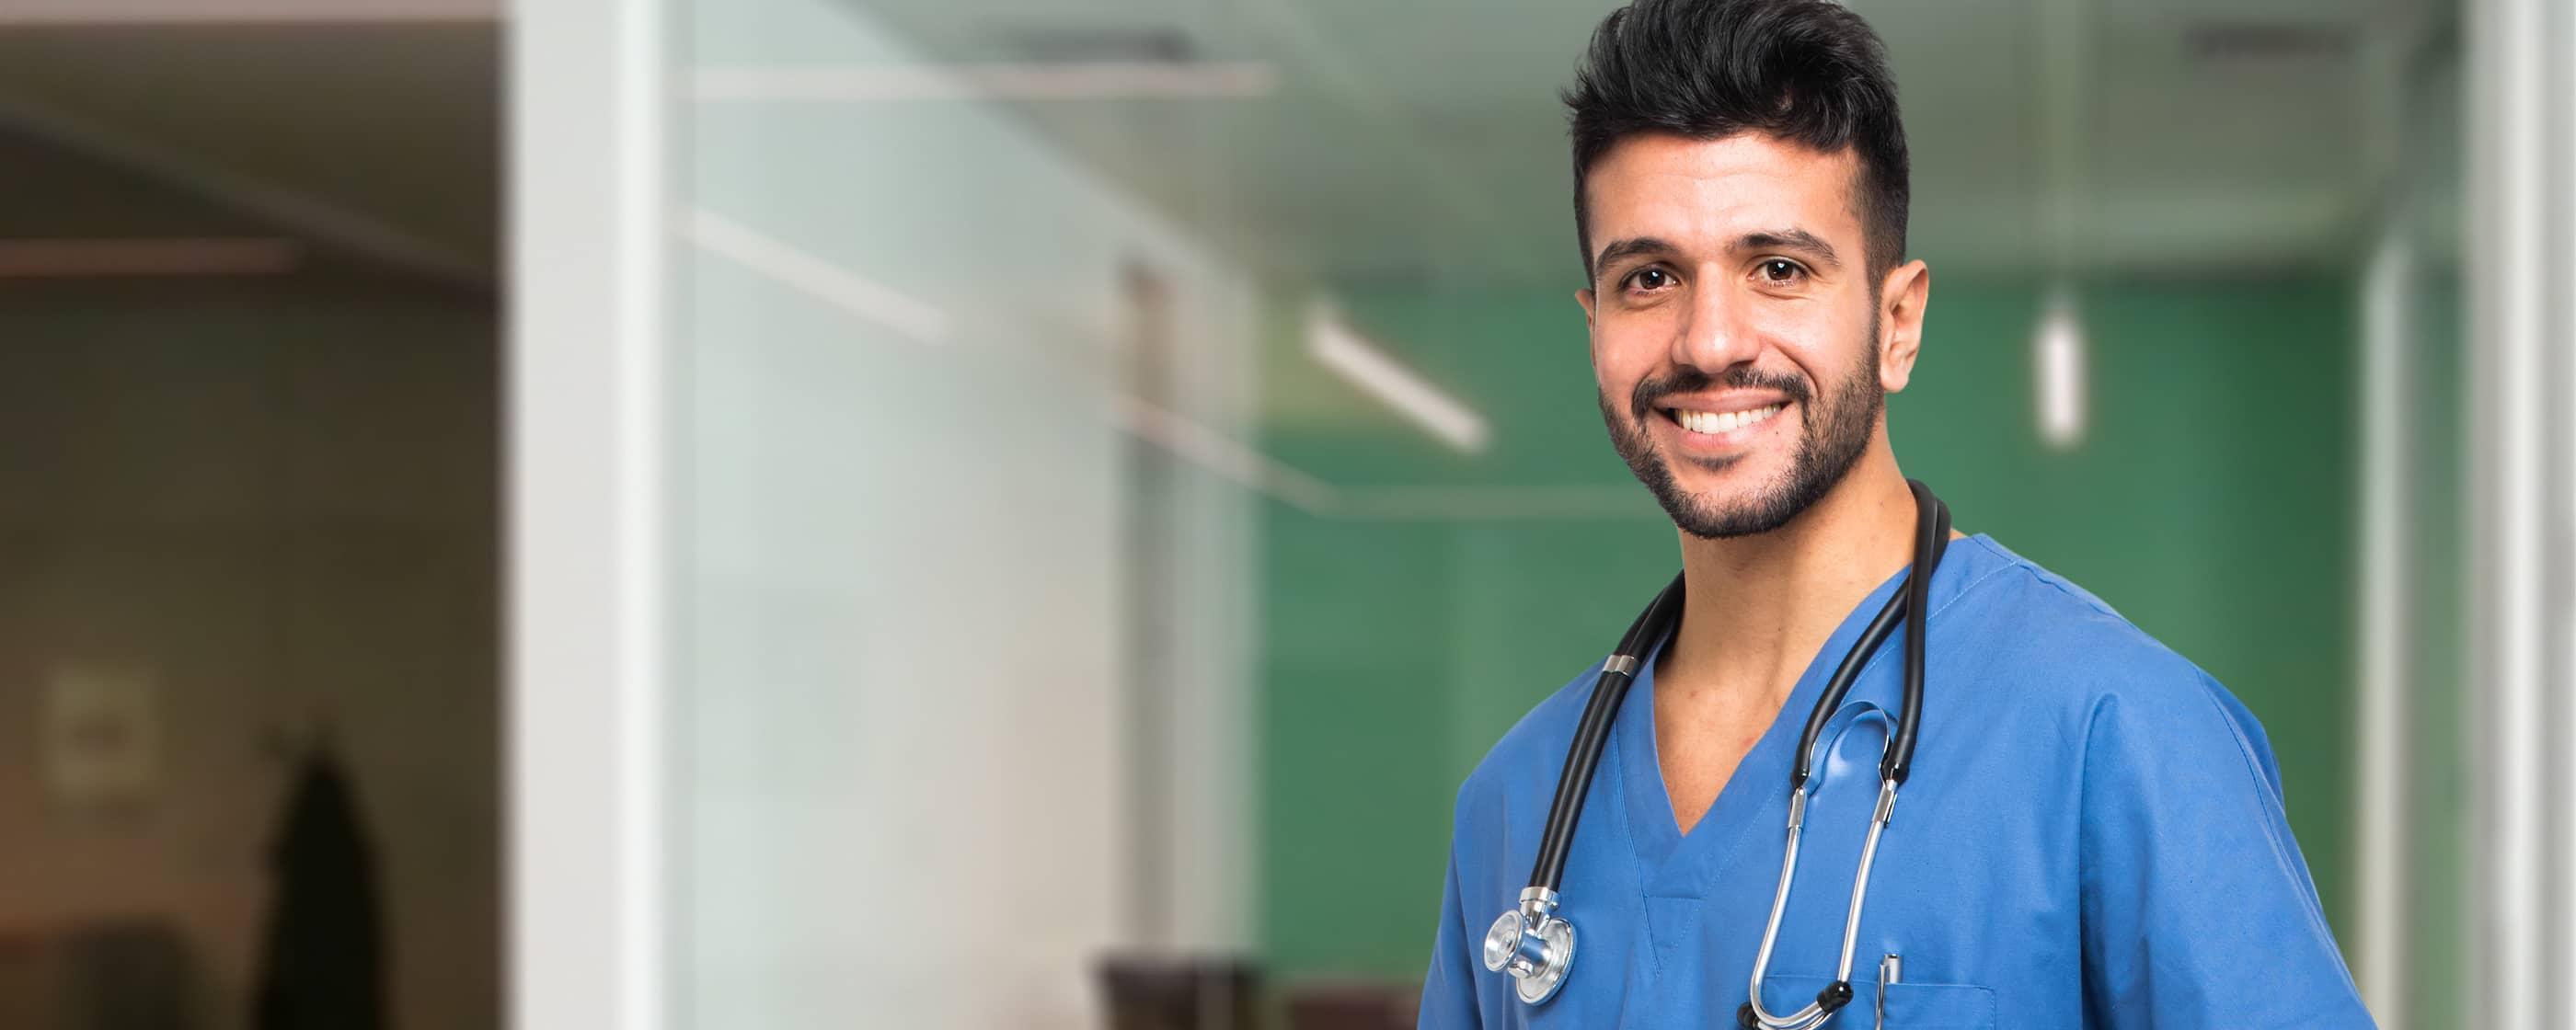 Bachelor of Science in Nursing